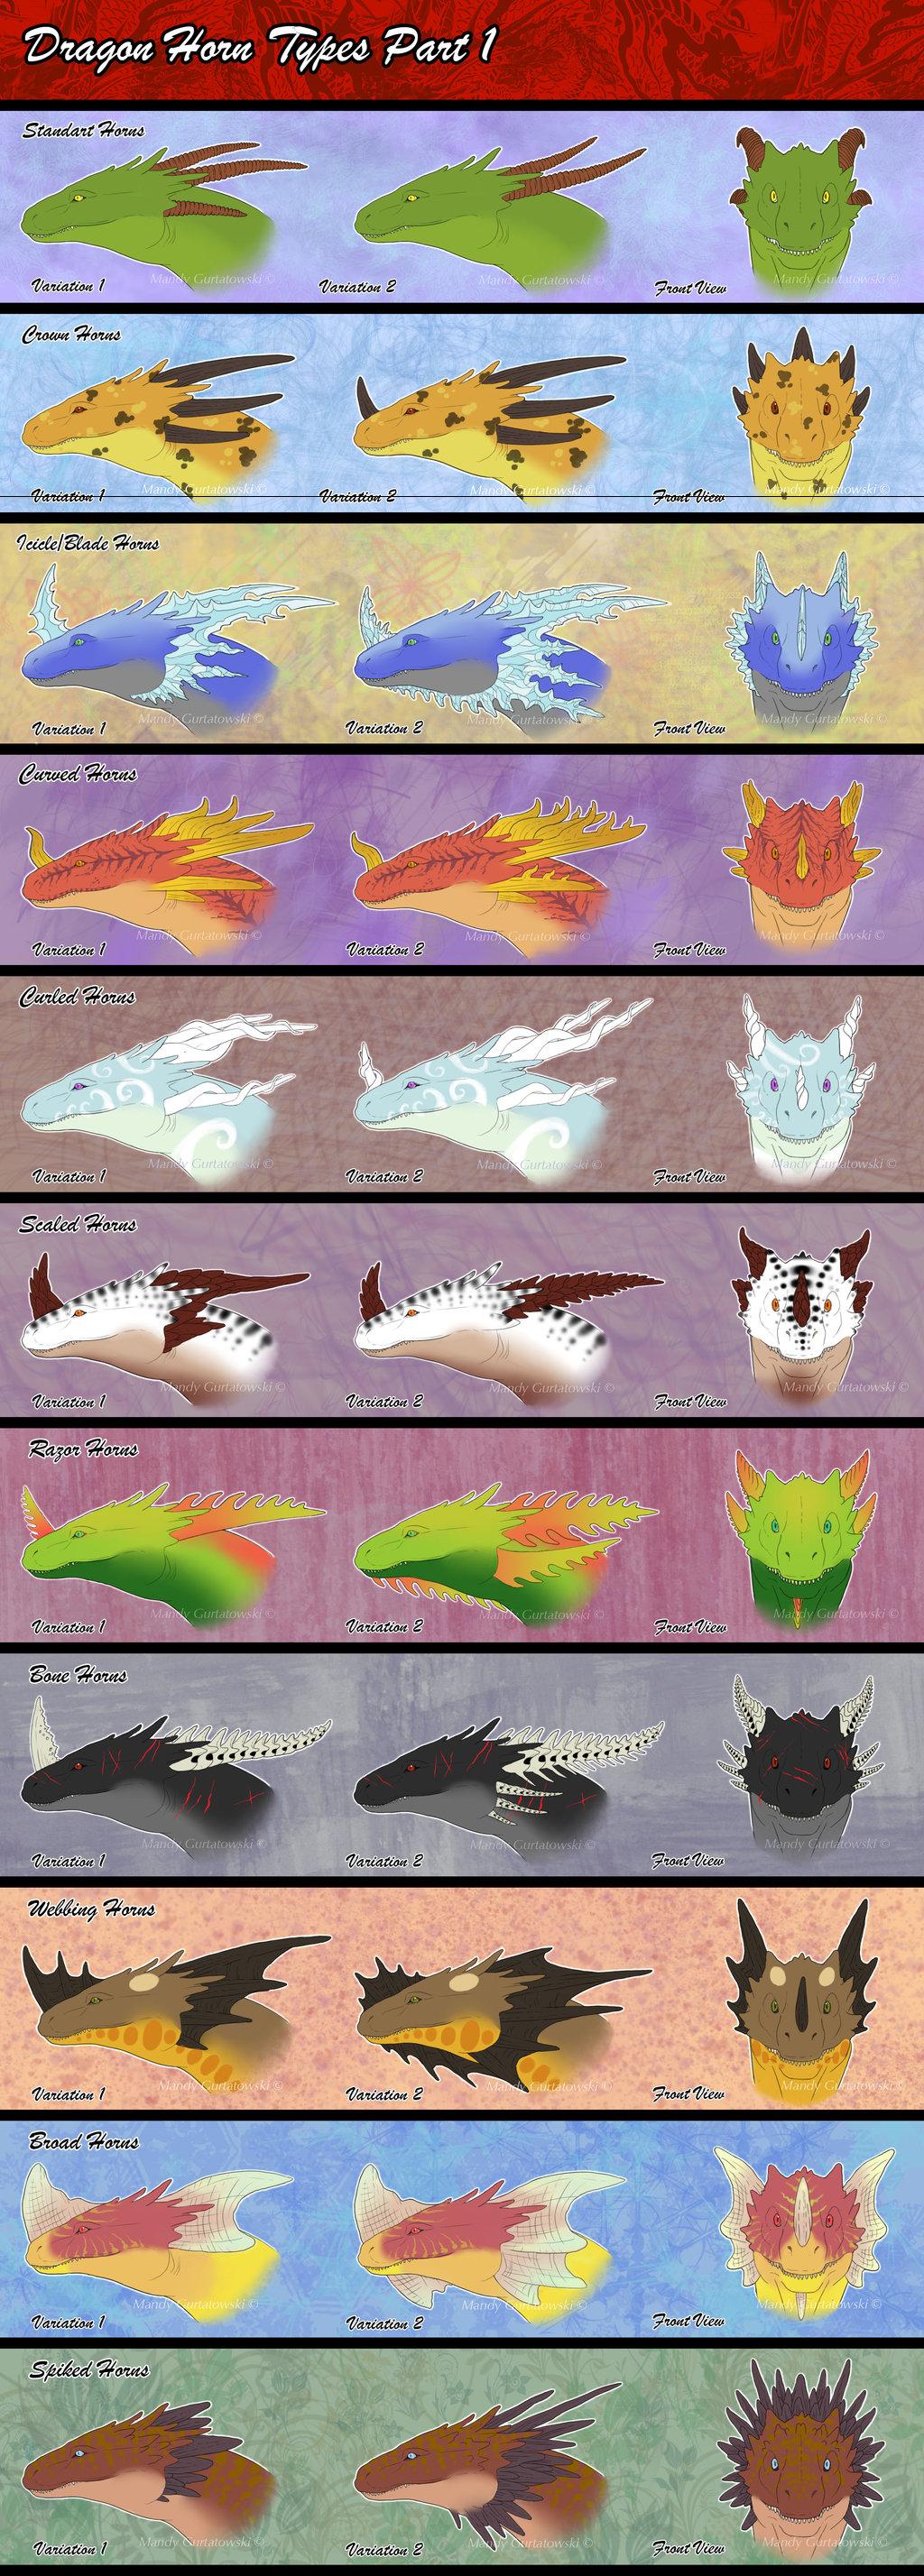 Drawn horns curved dragon Types Araless Dragon Dragon Horn